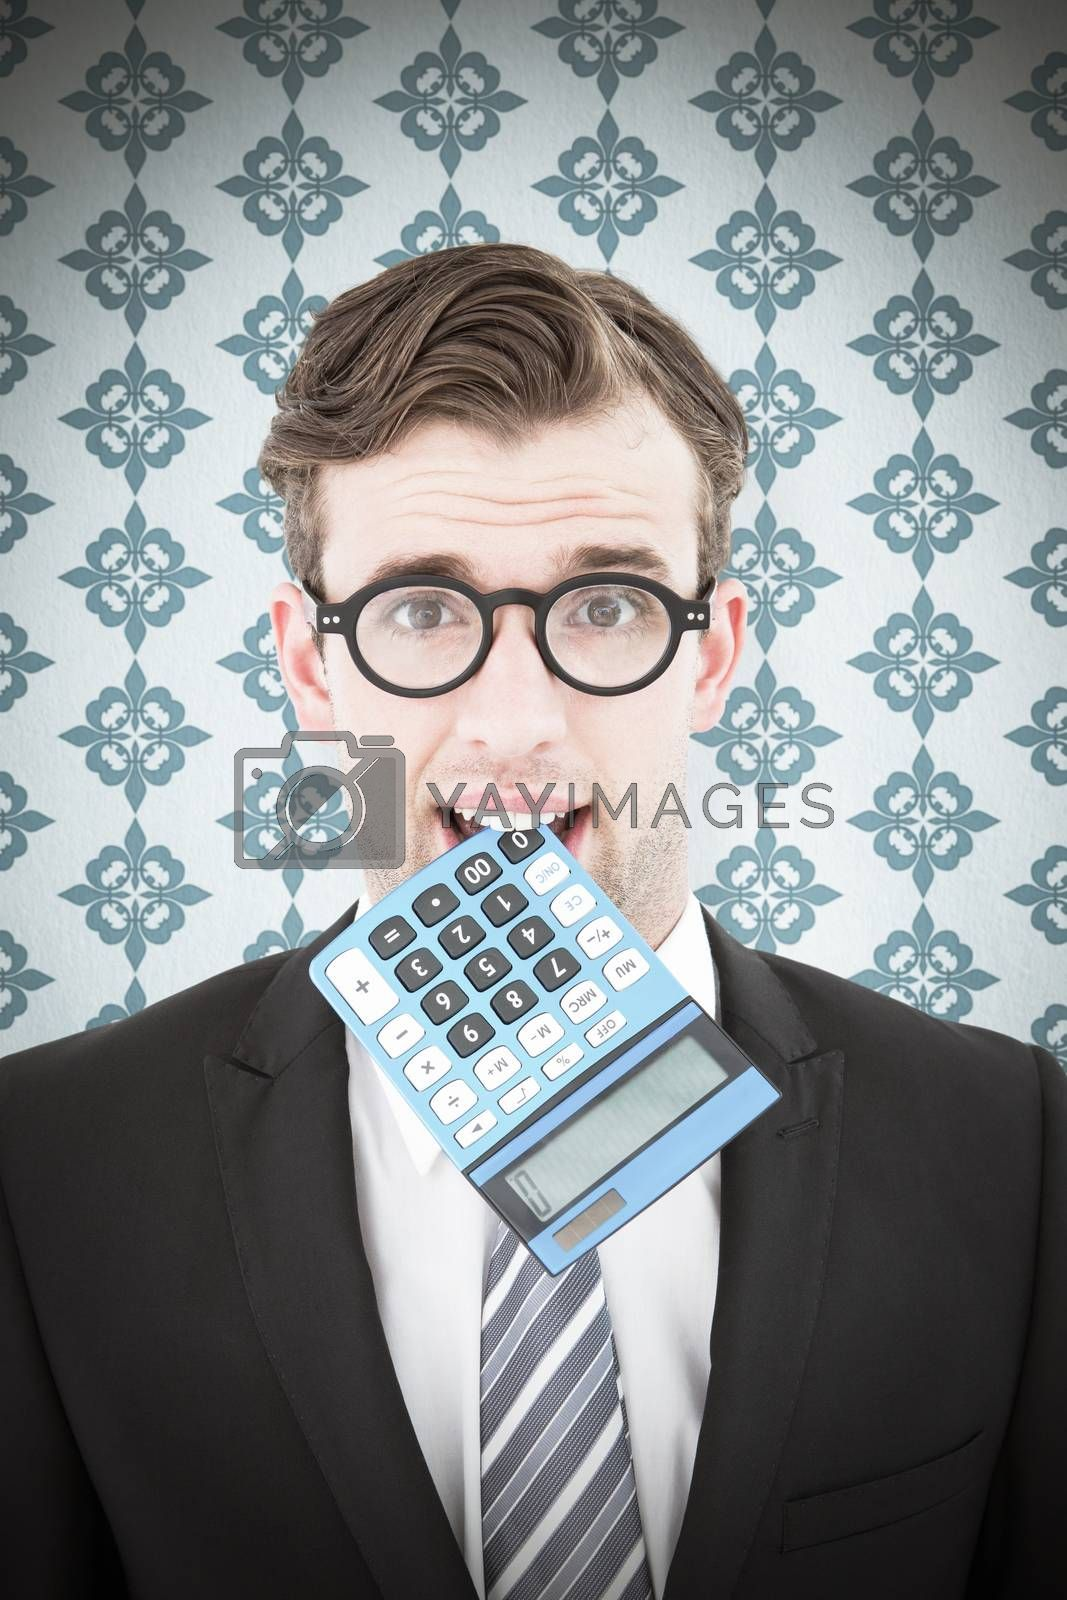 Geeky businessman biting calculator against blue background